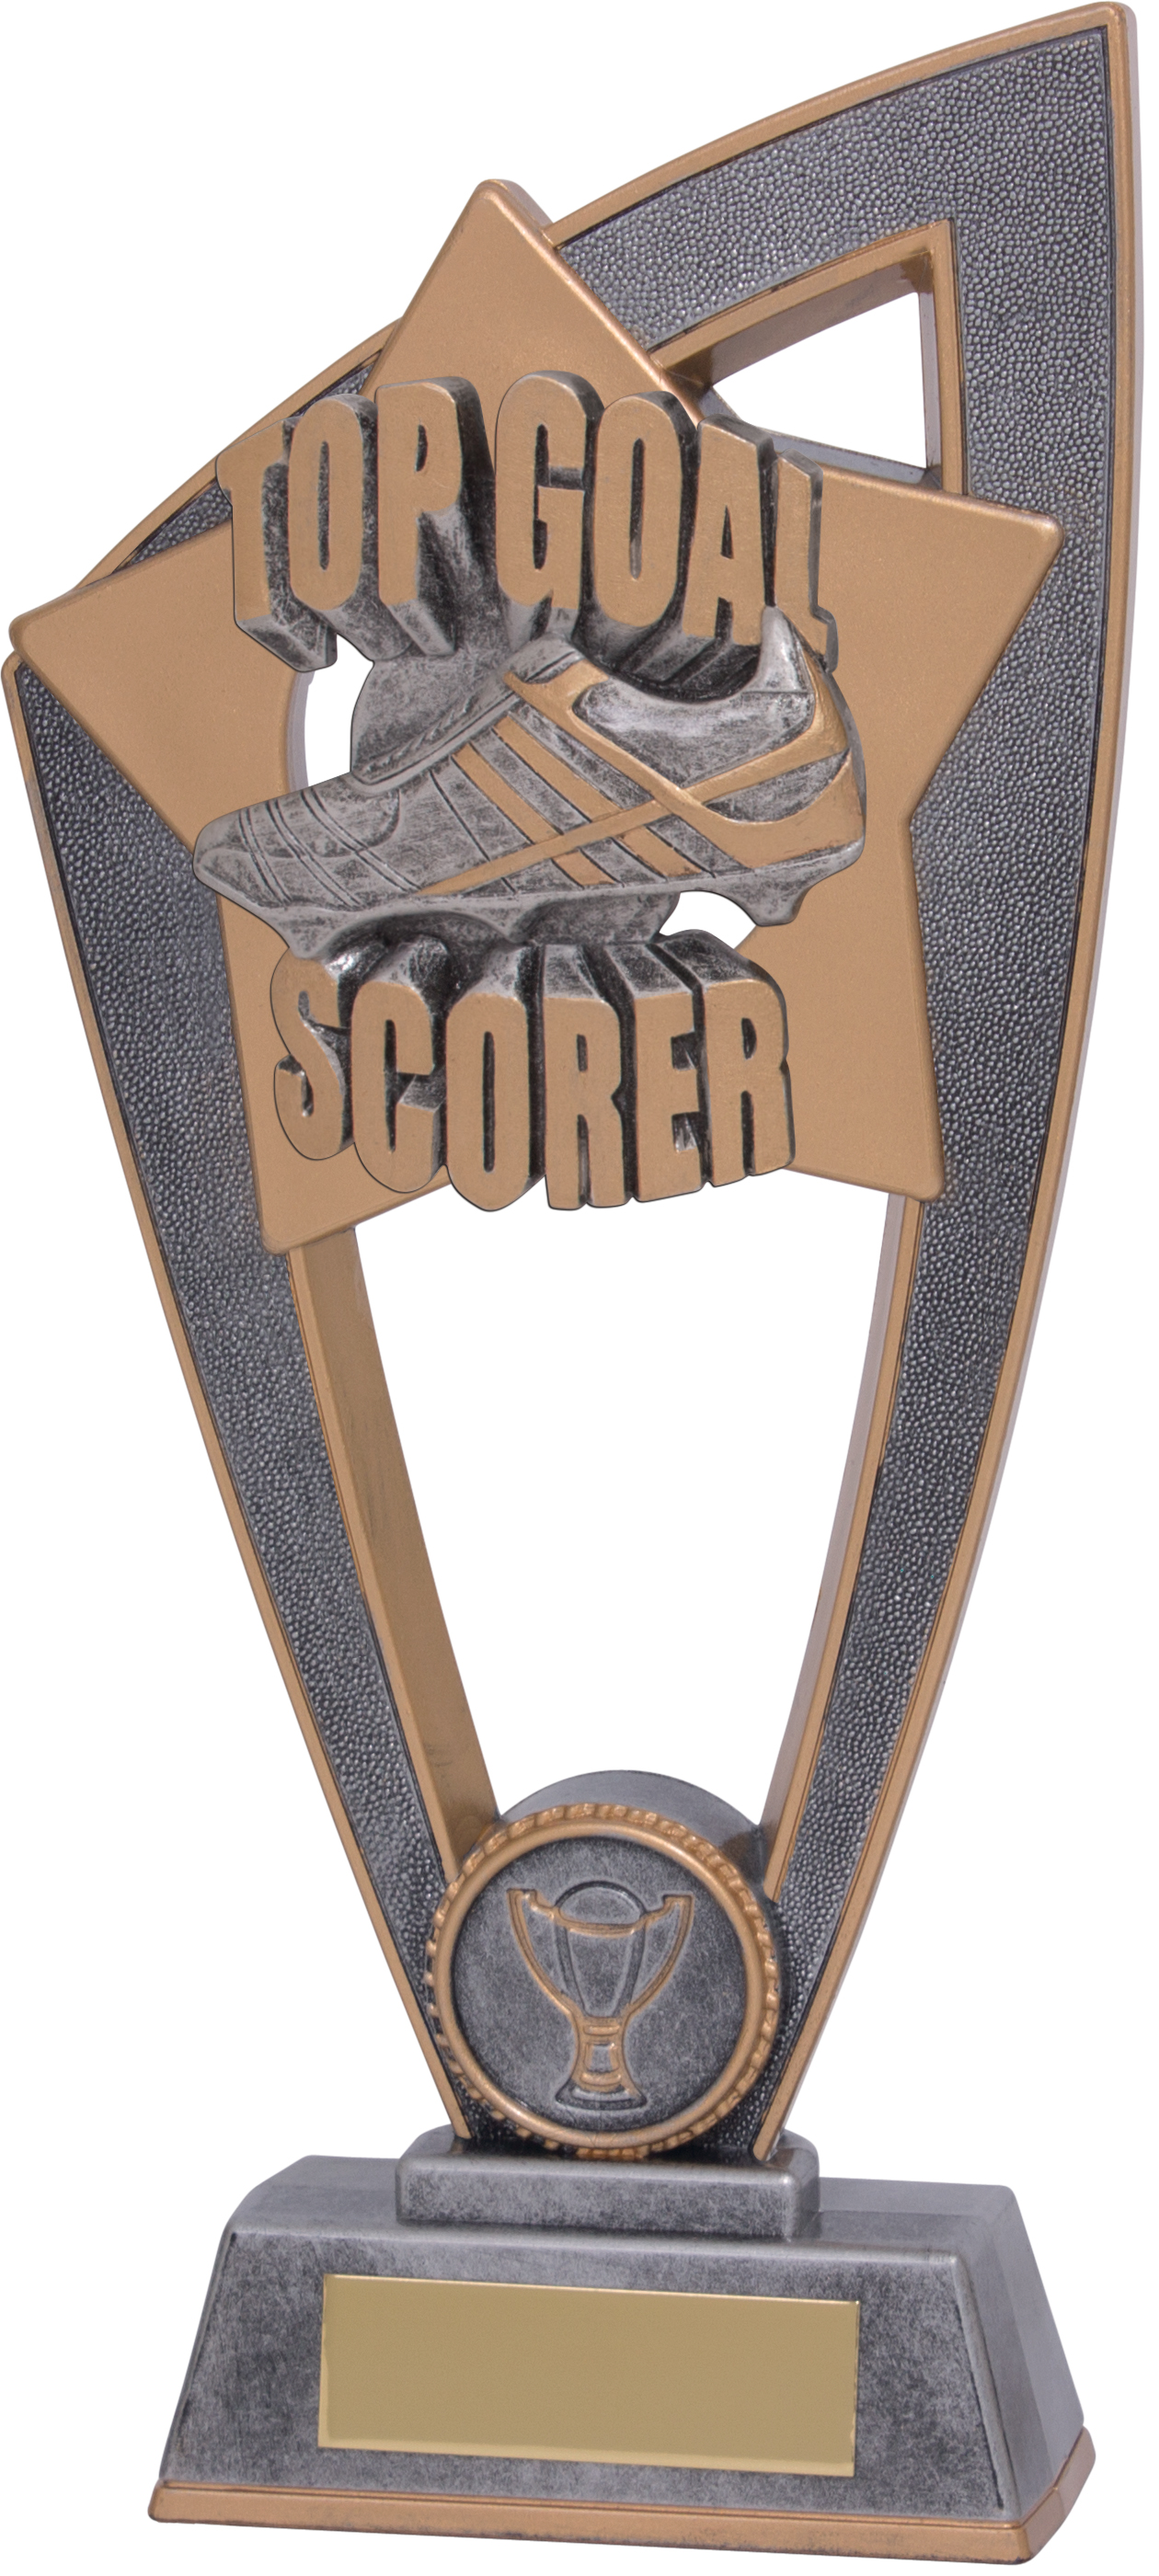 "Top Goal Scorer Star Blast Trophy 23cm (9"")"